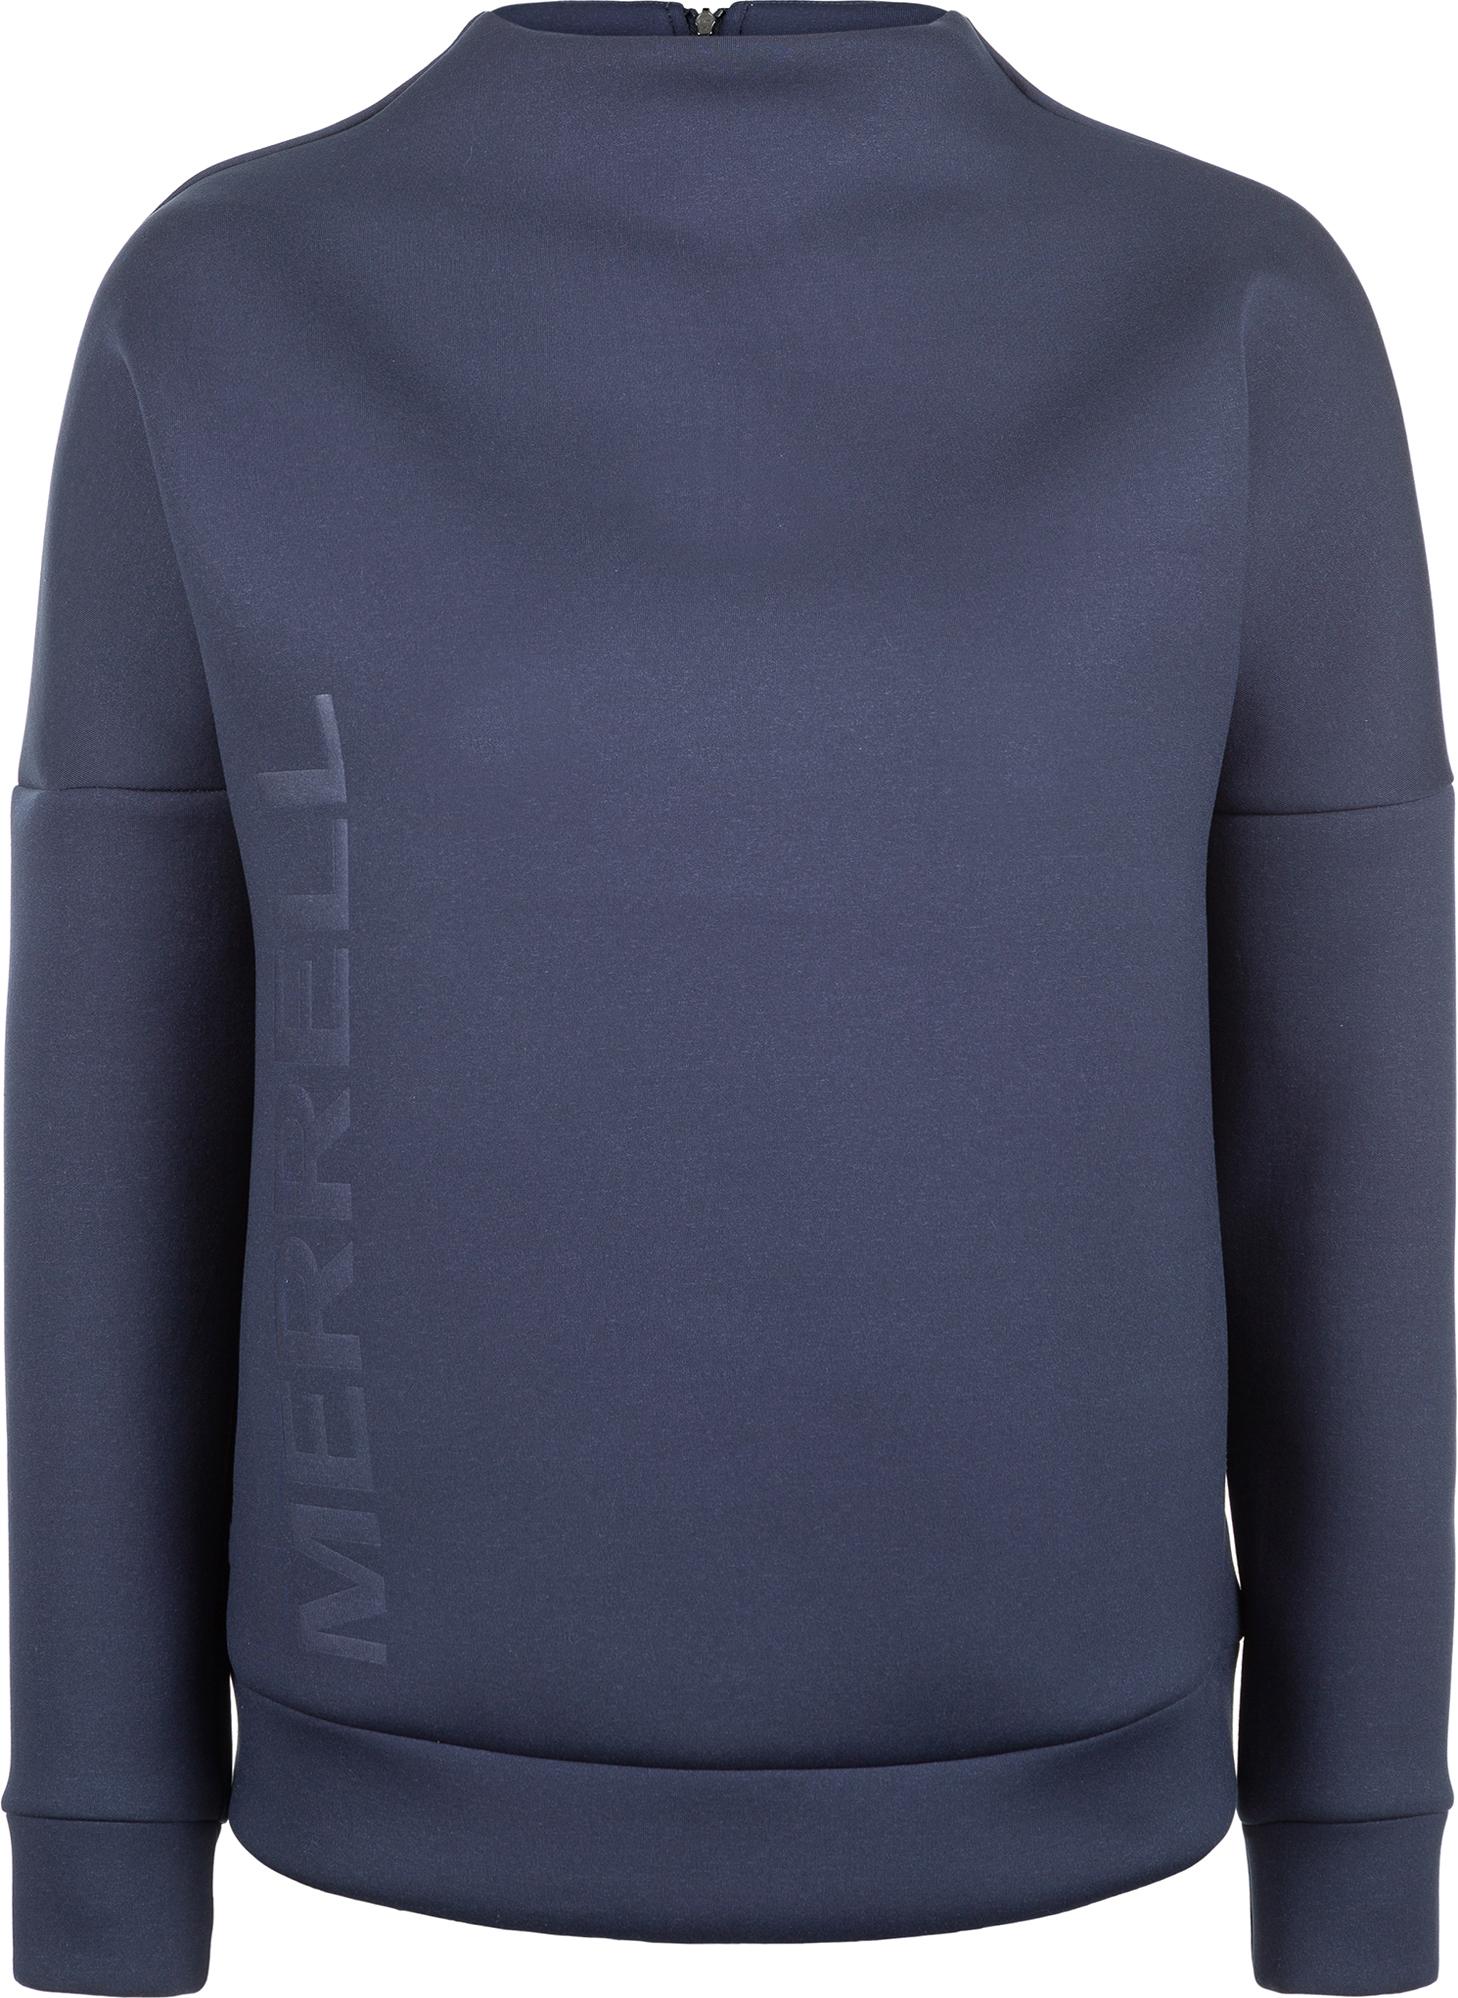 Merrell Свитшот женский Merrell, размер 42 пуховик женский merrell women s jacket цвет петроль a19amrjaw02 s3 размер 46